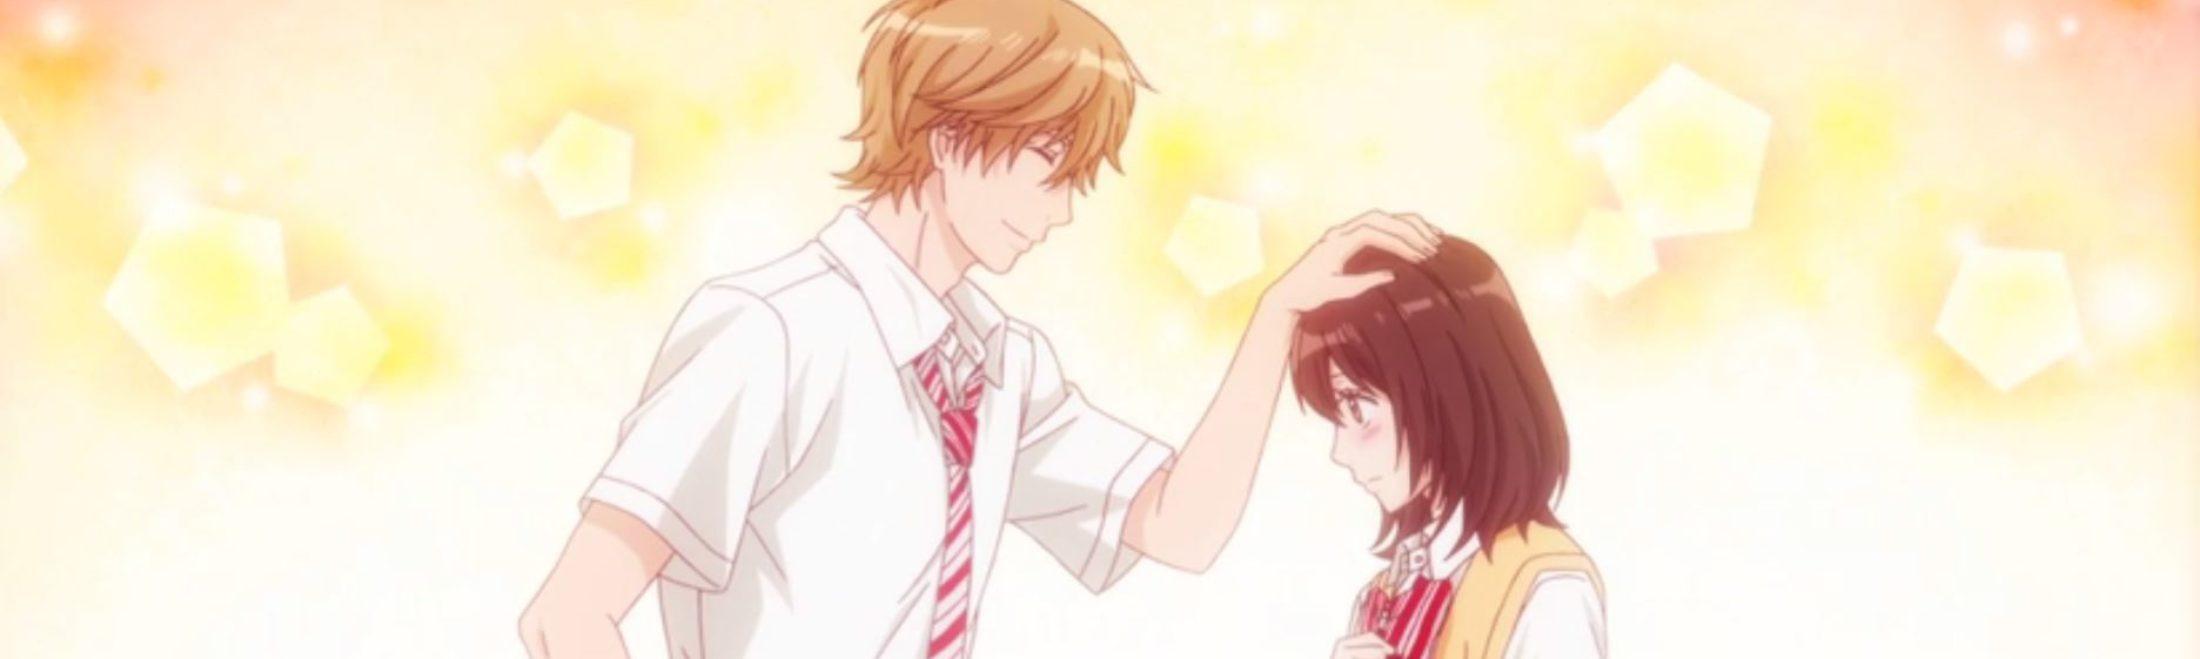 TVアニメ「オオカミ少女と黒王子」公式サイト